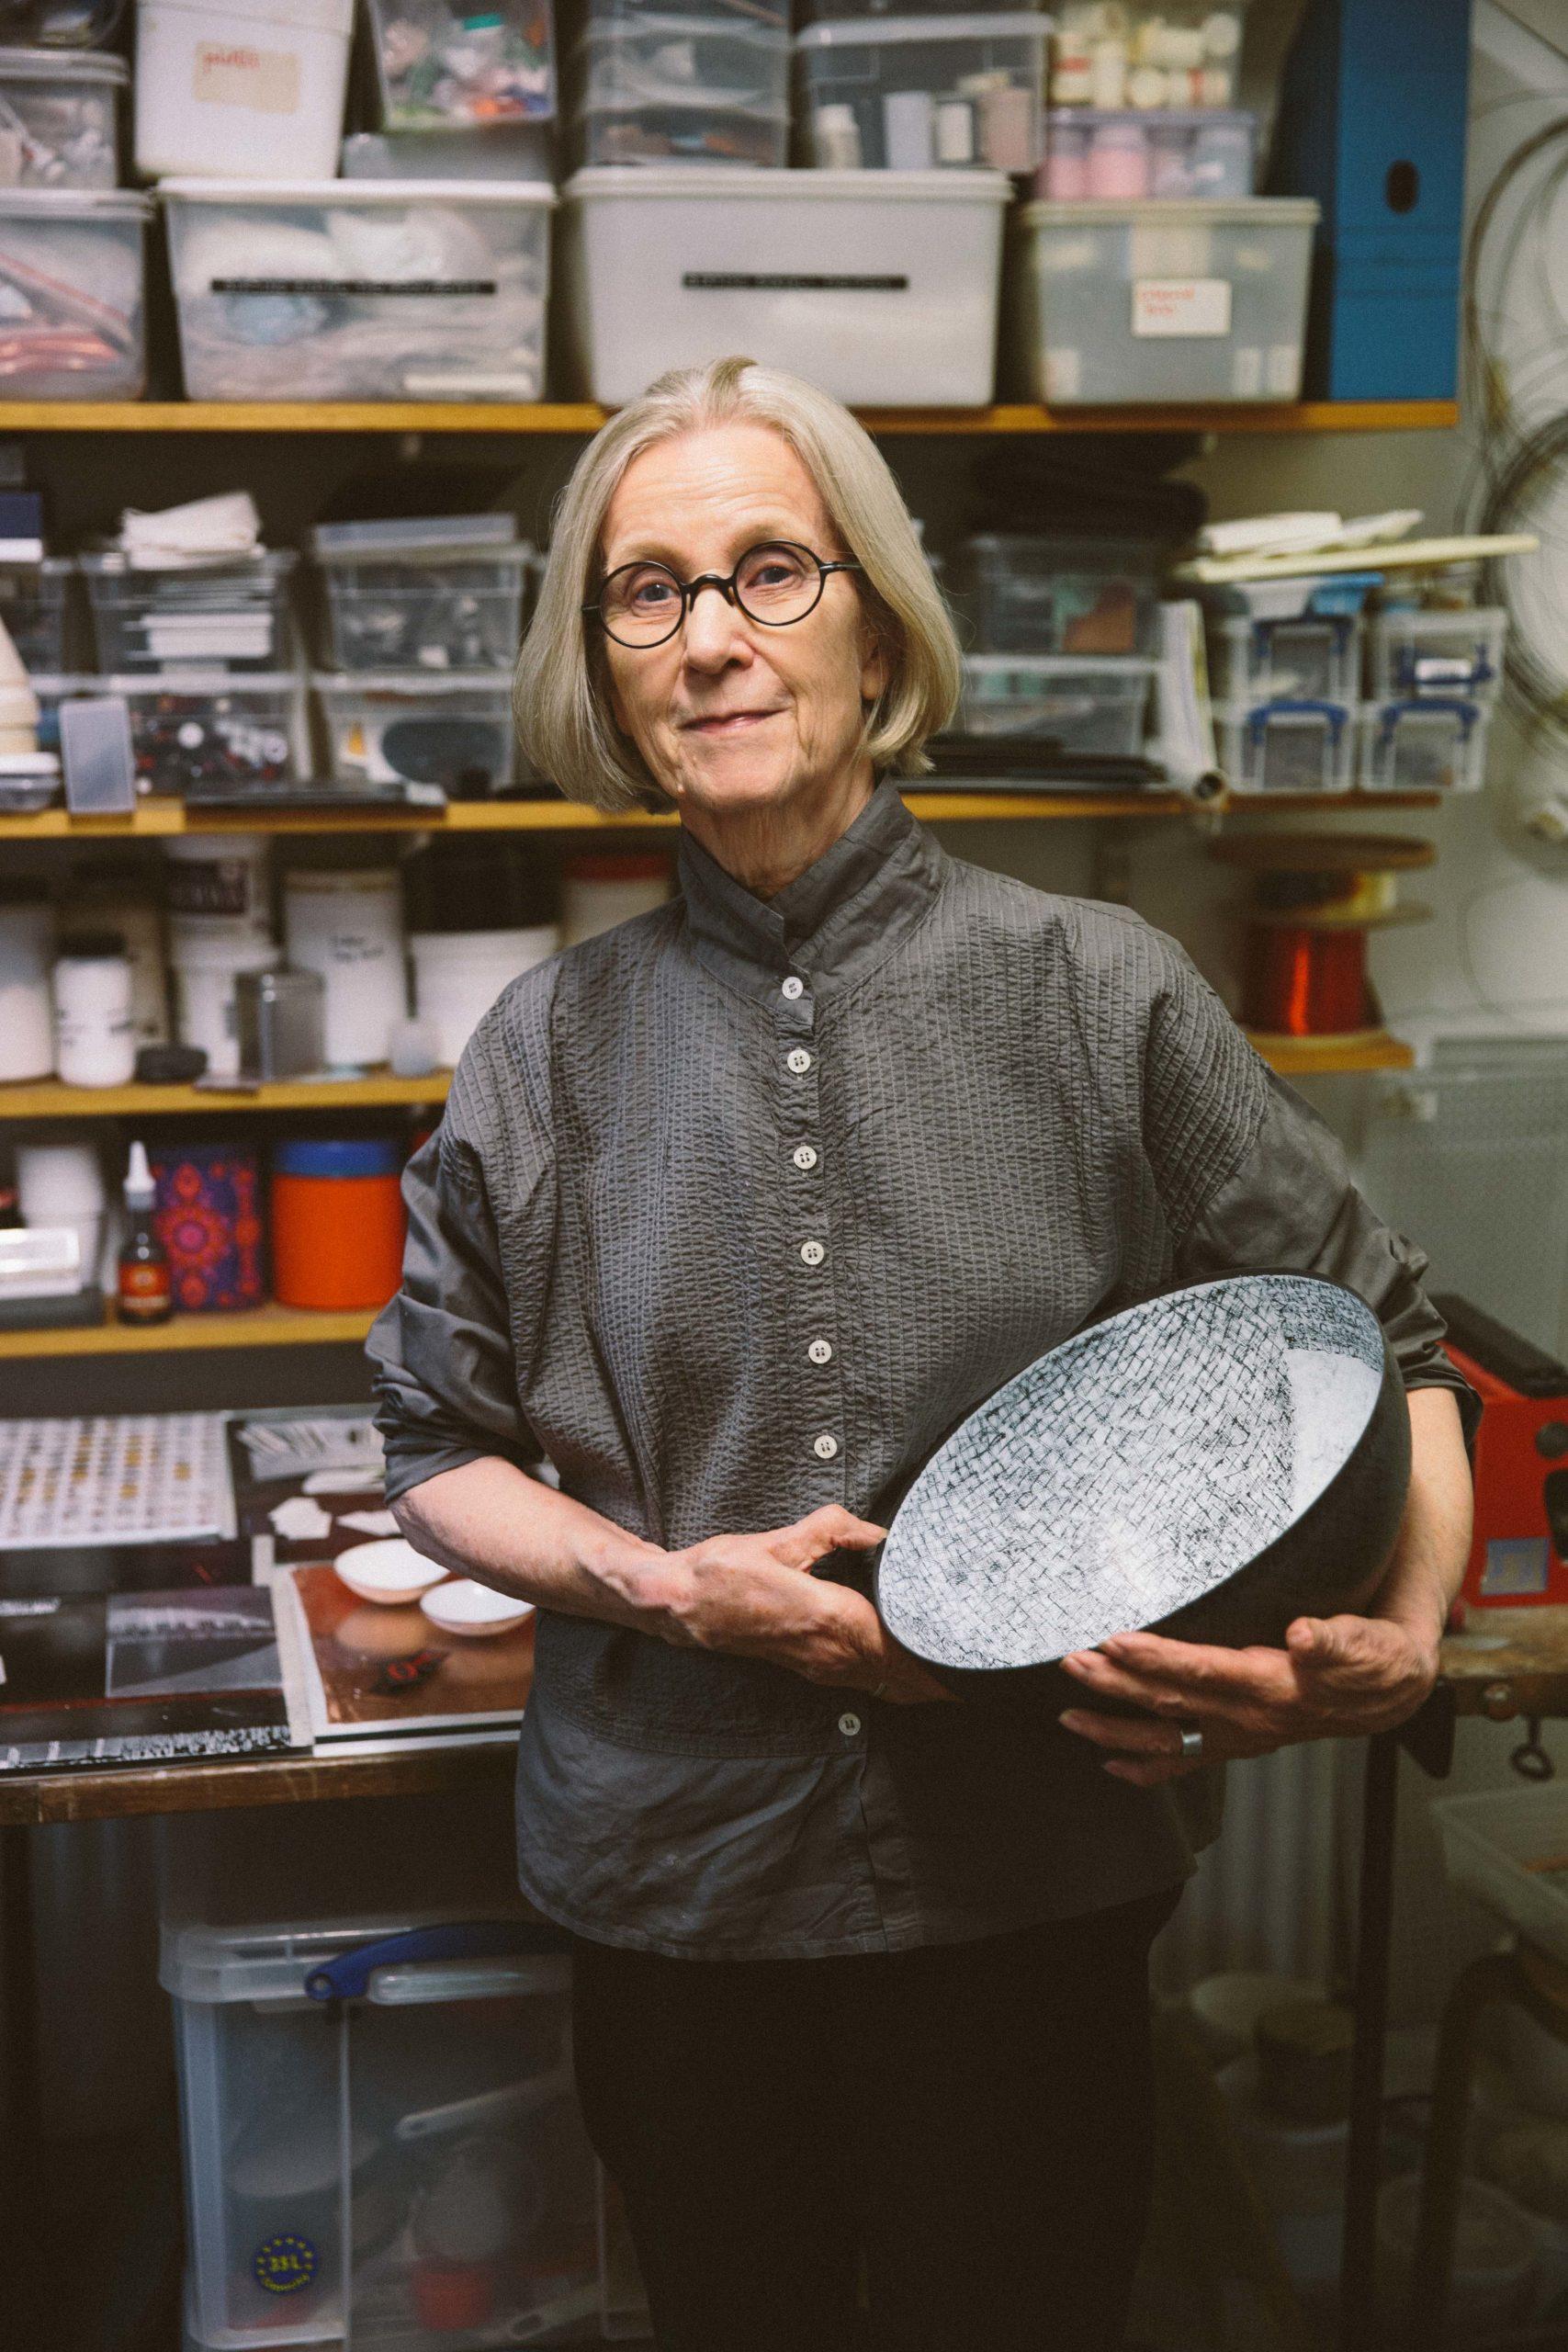 Elizabeth Turrell holding a bowl